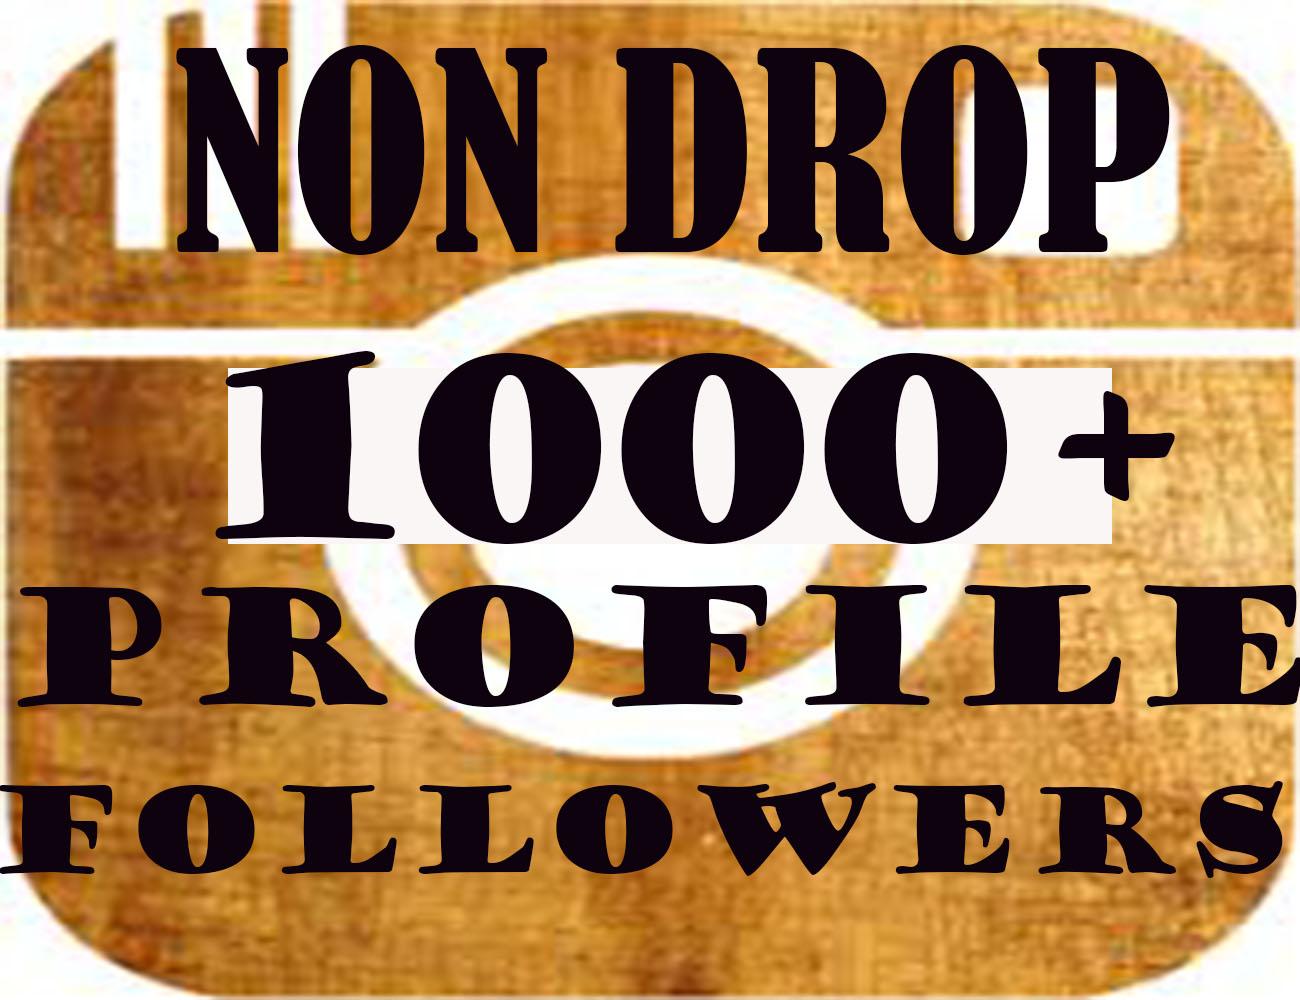 1000+Profile Followers In 1-2H[PERMANENT]